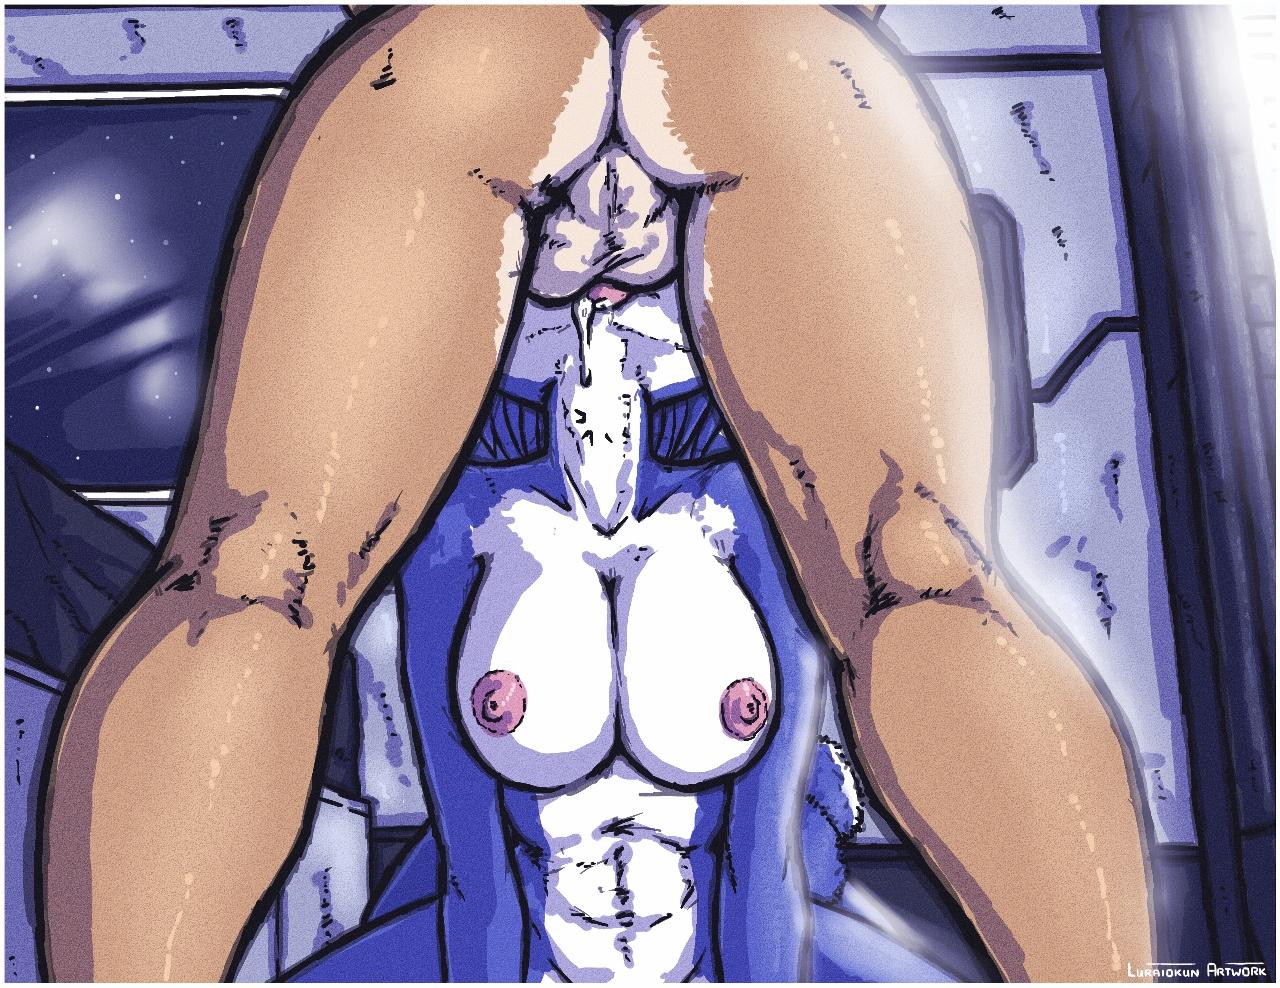 Starfox Imageset porn comics Oral sex, Anal Sex, Furry, Group Sex